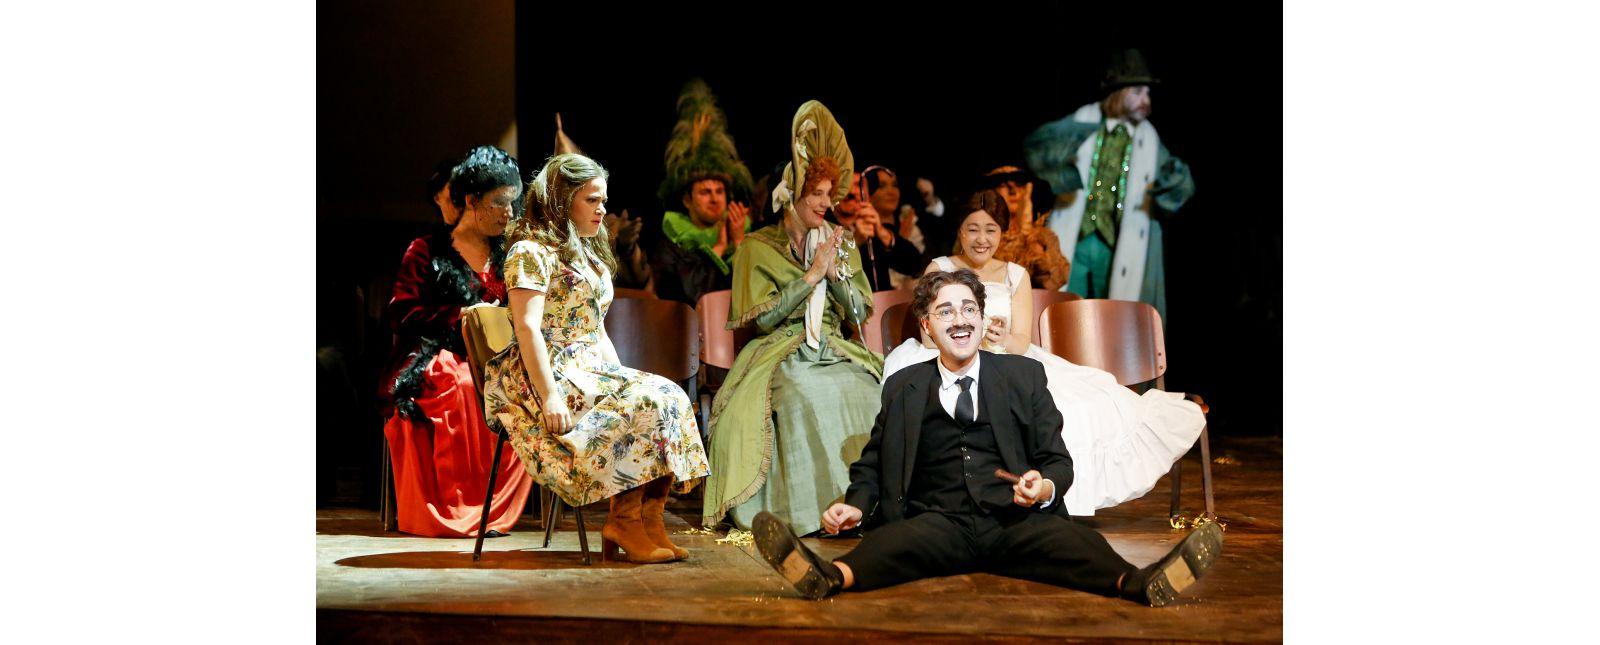 Love Life // Rebecca Jo Loeb, John Carpenter, Tim Al-Windawe, Opernchor des Theater Freiburg // 2017 // Birgit Hupfeld